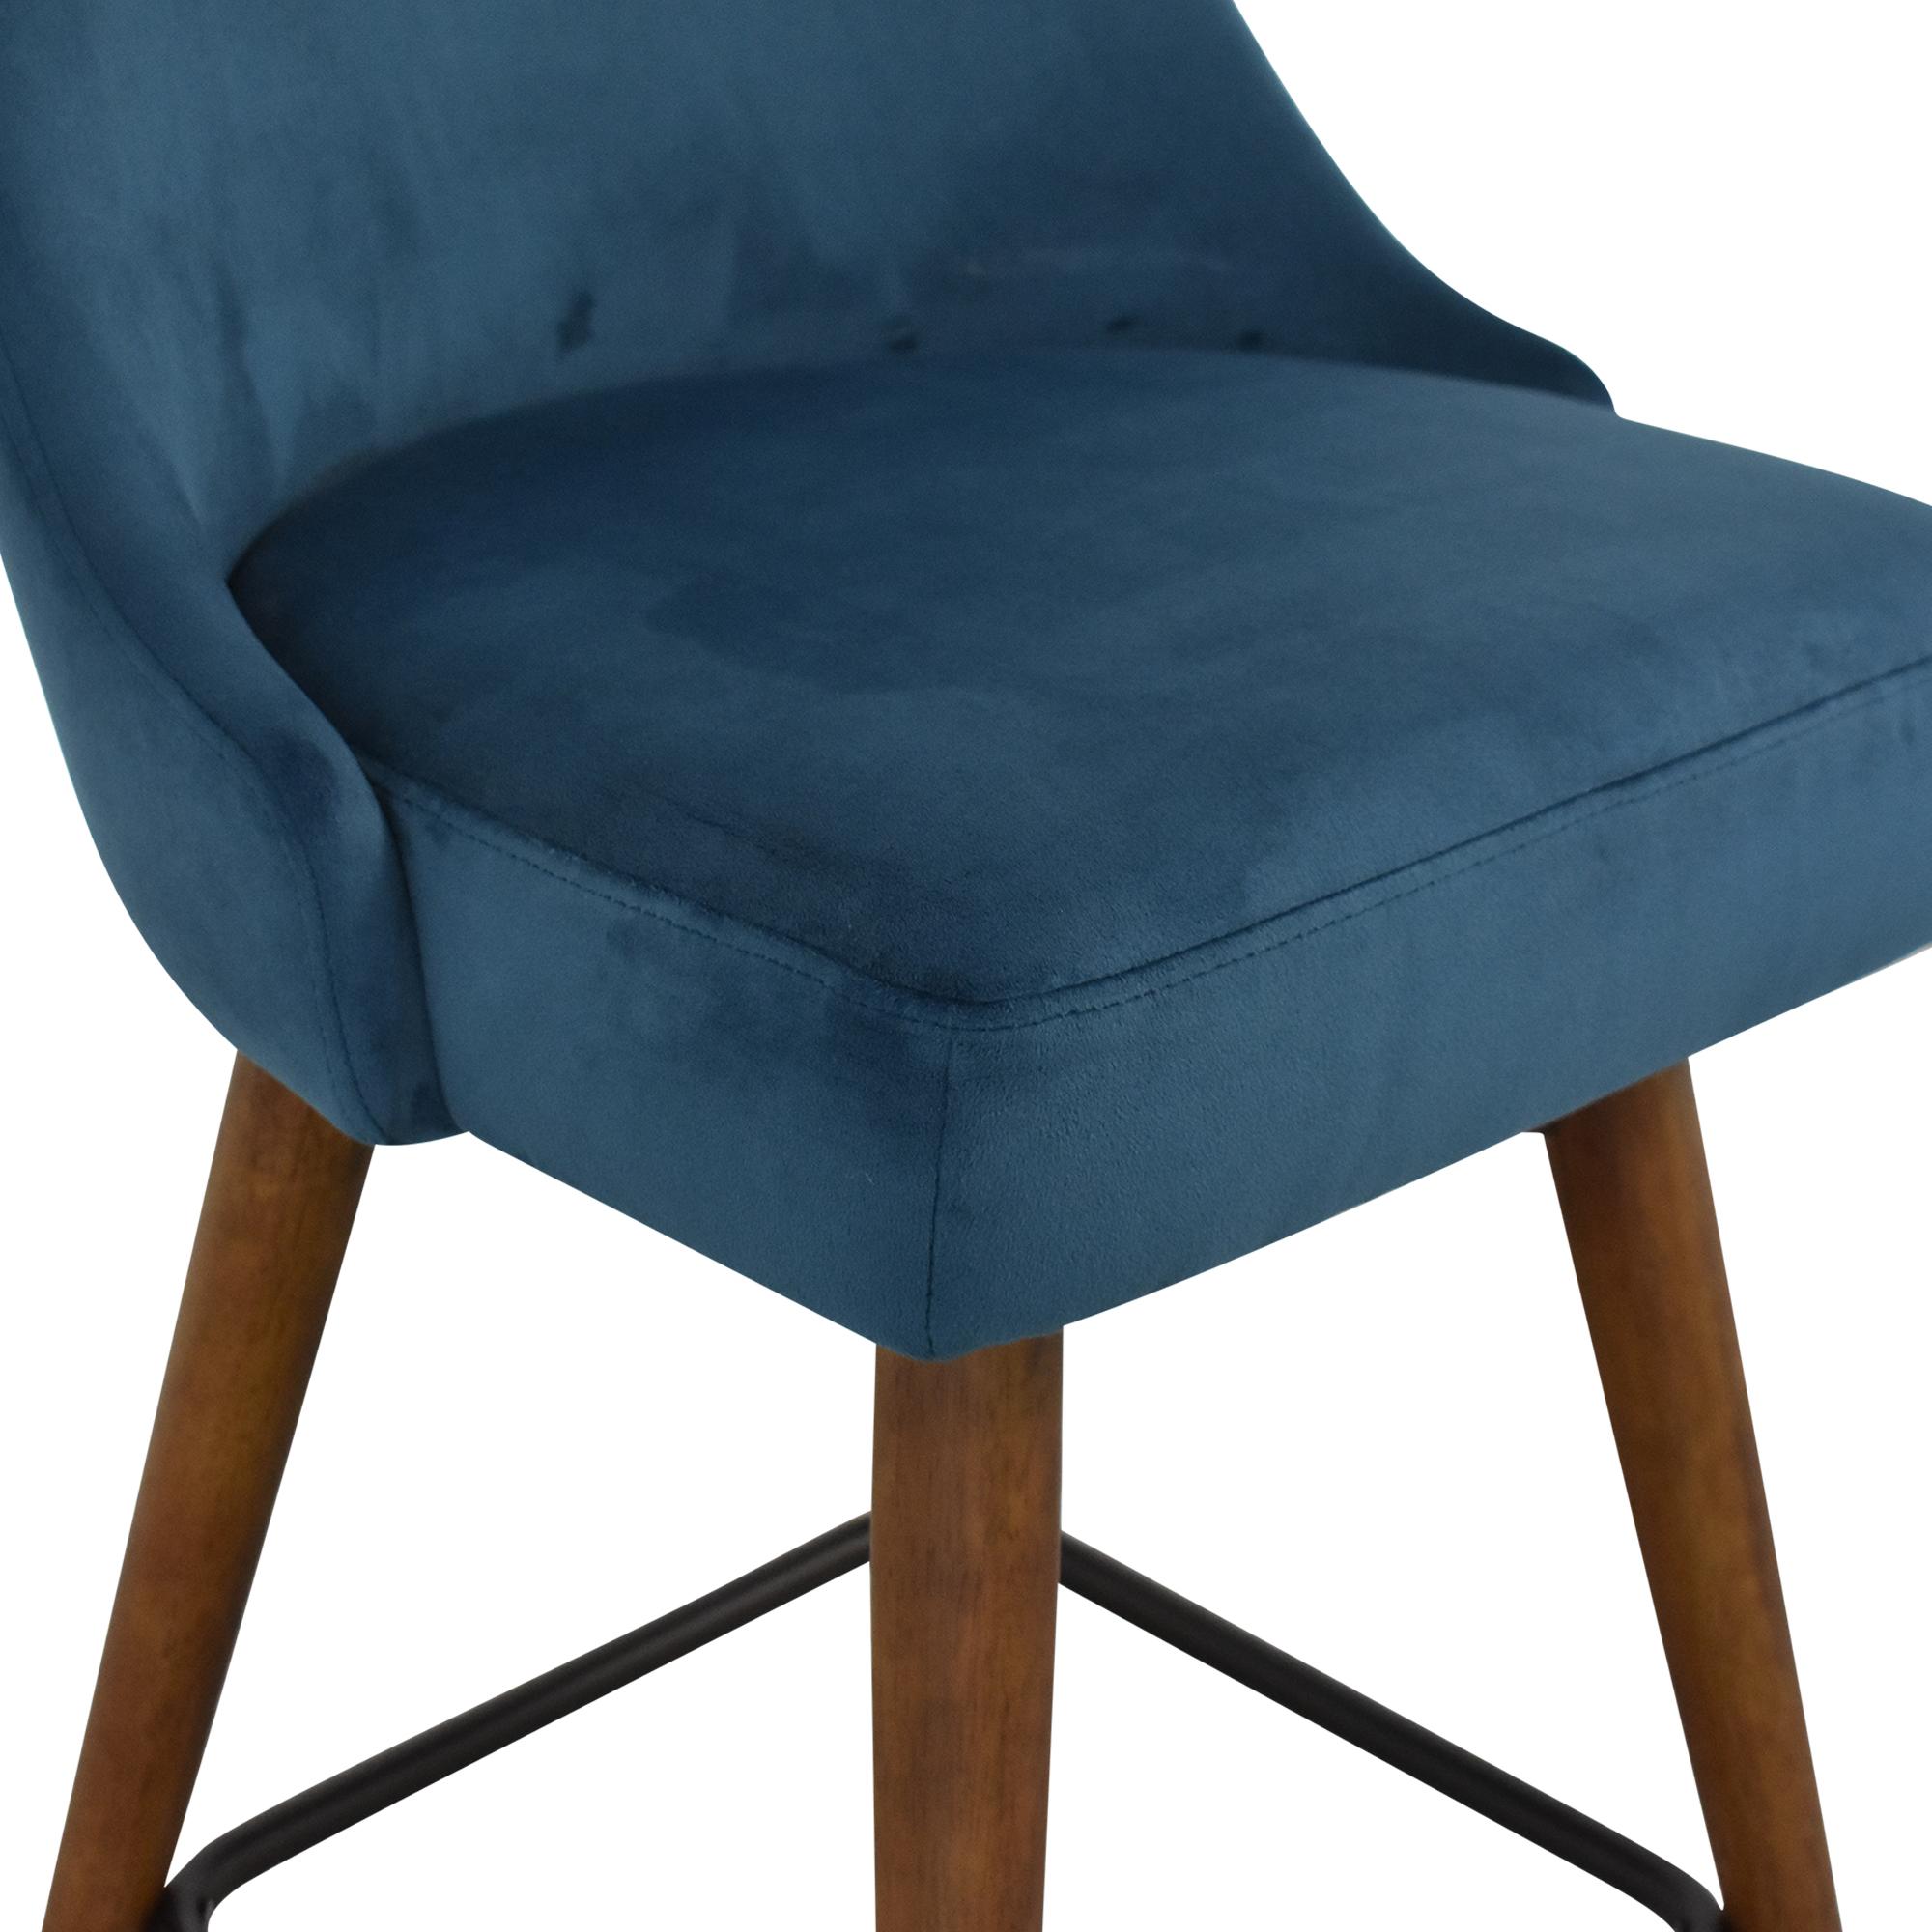 West Elm West Elm Mid-Century Upholstered Swivel Counter Stool price